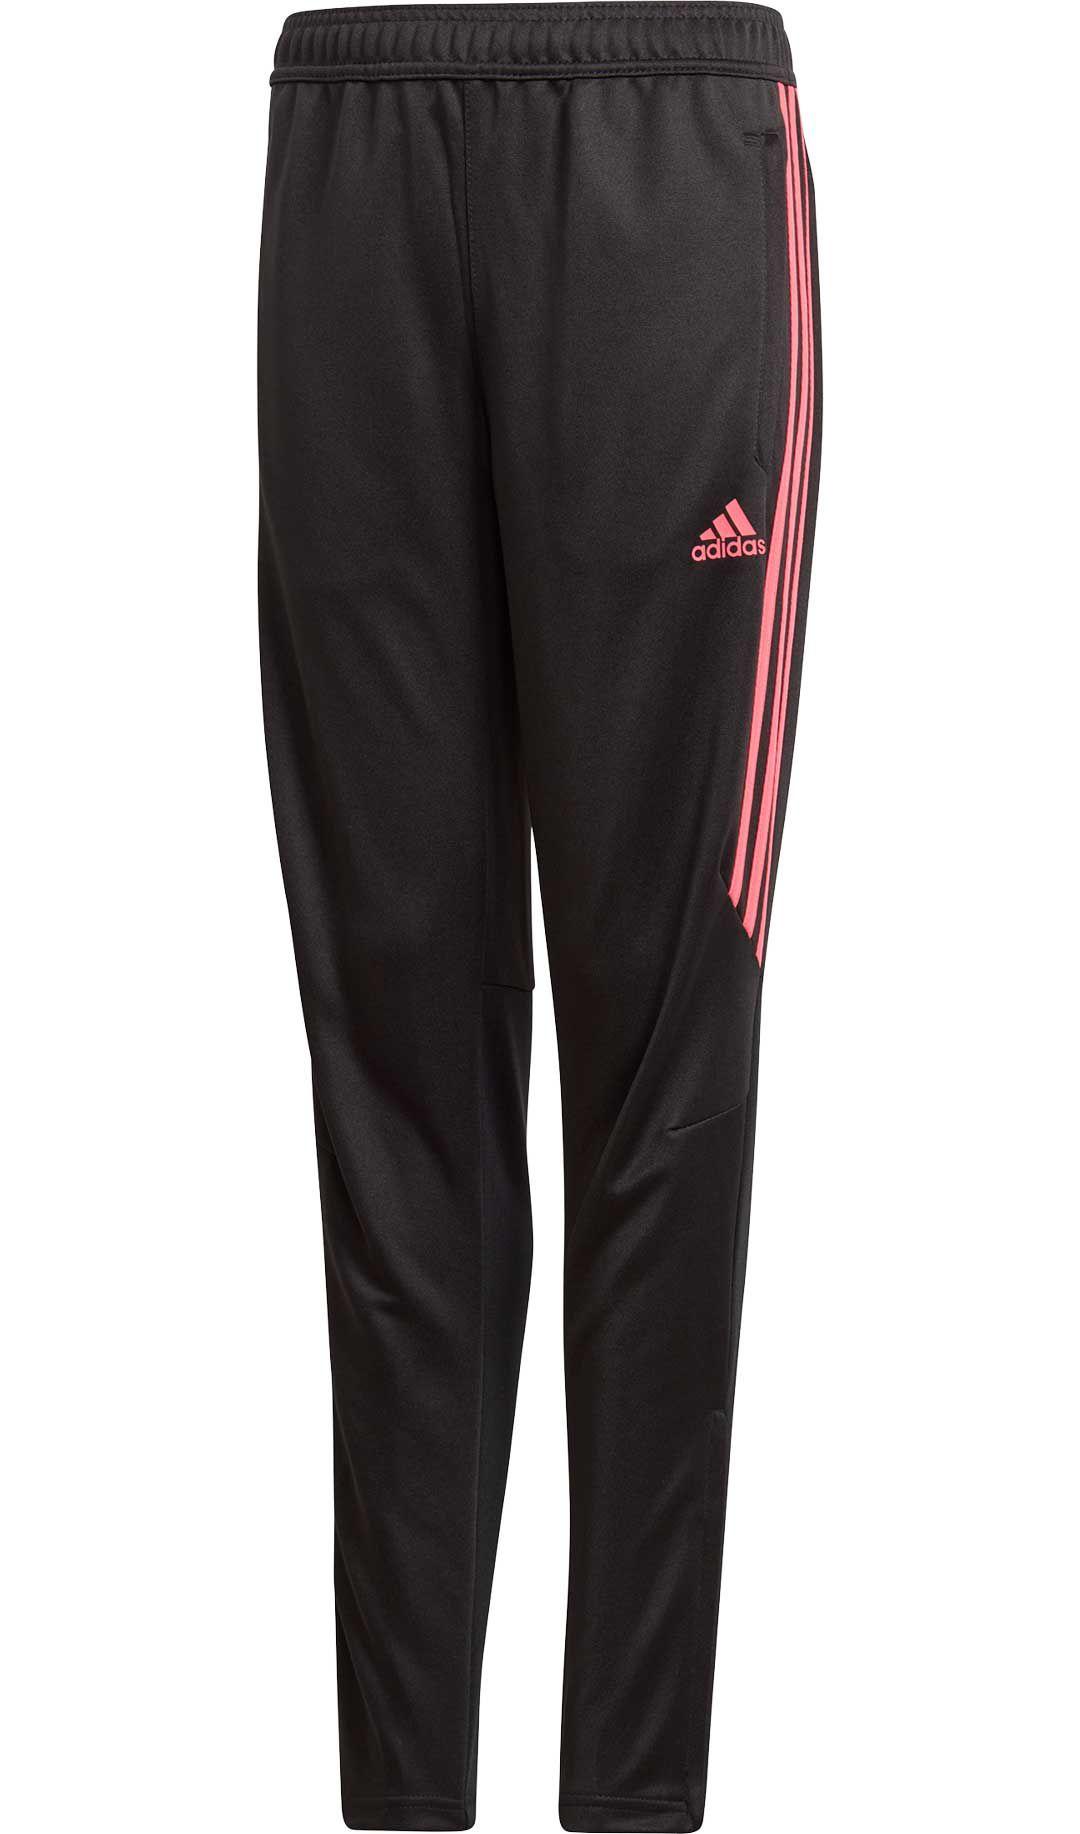 adidas Core18 Training Pants Pants Women Dark BlueWhite